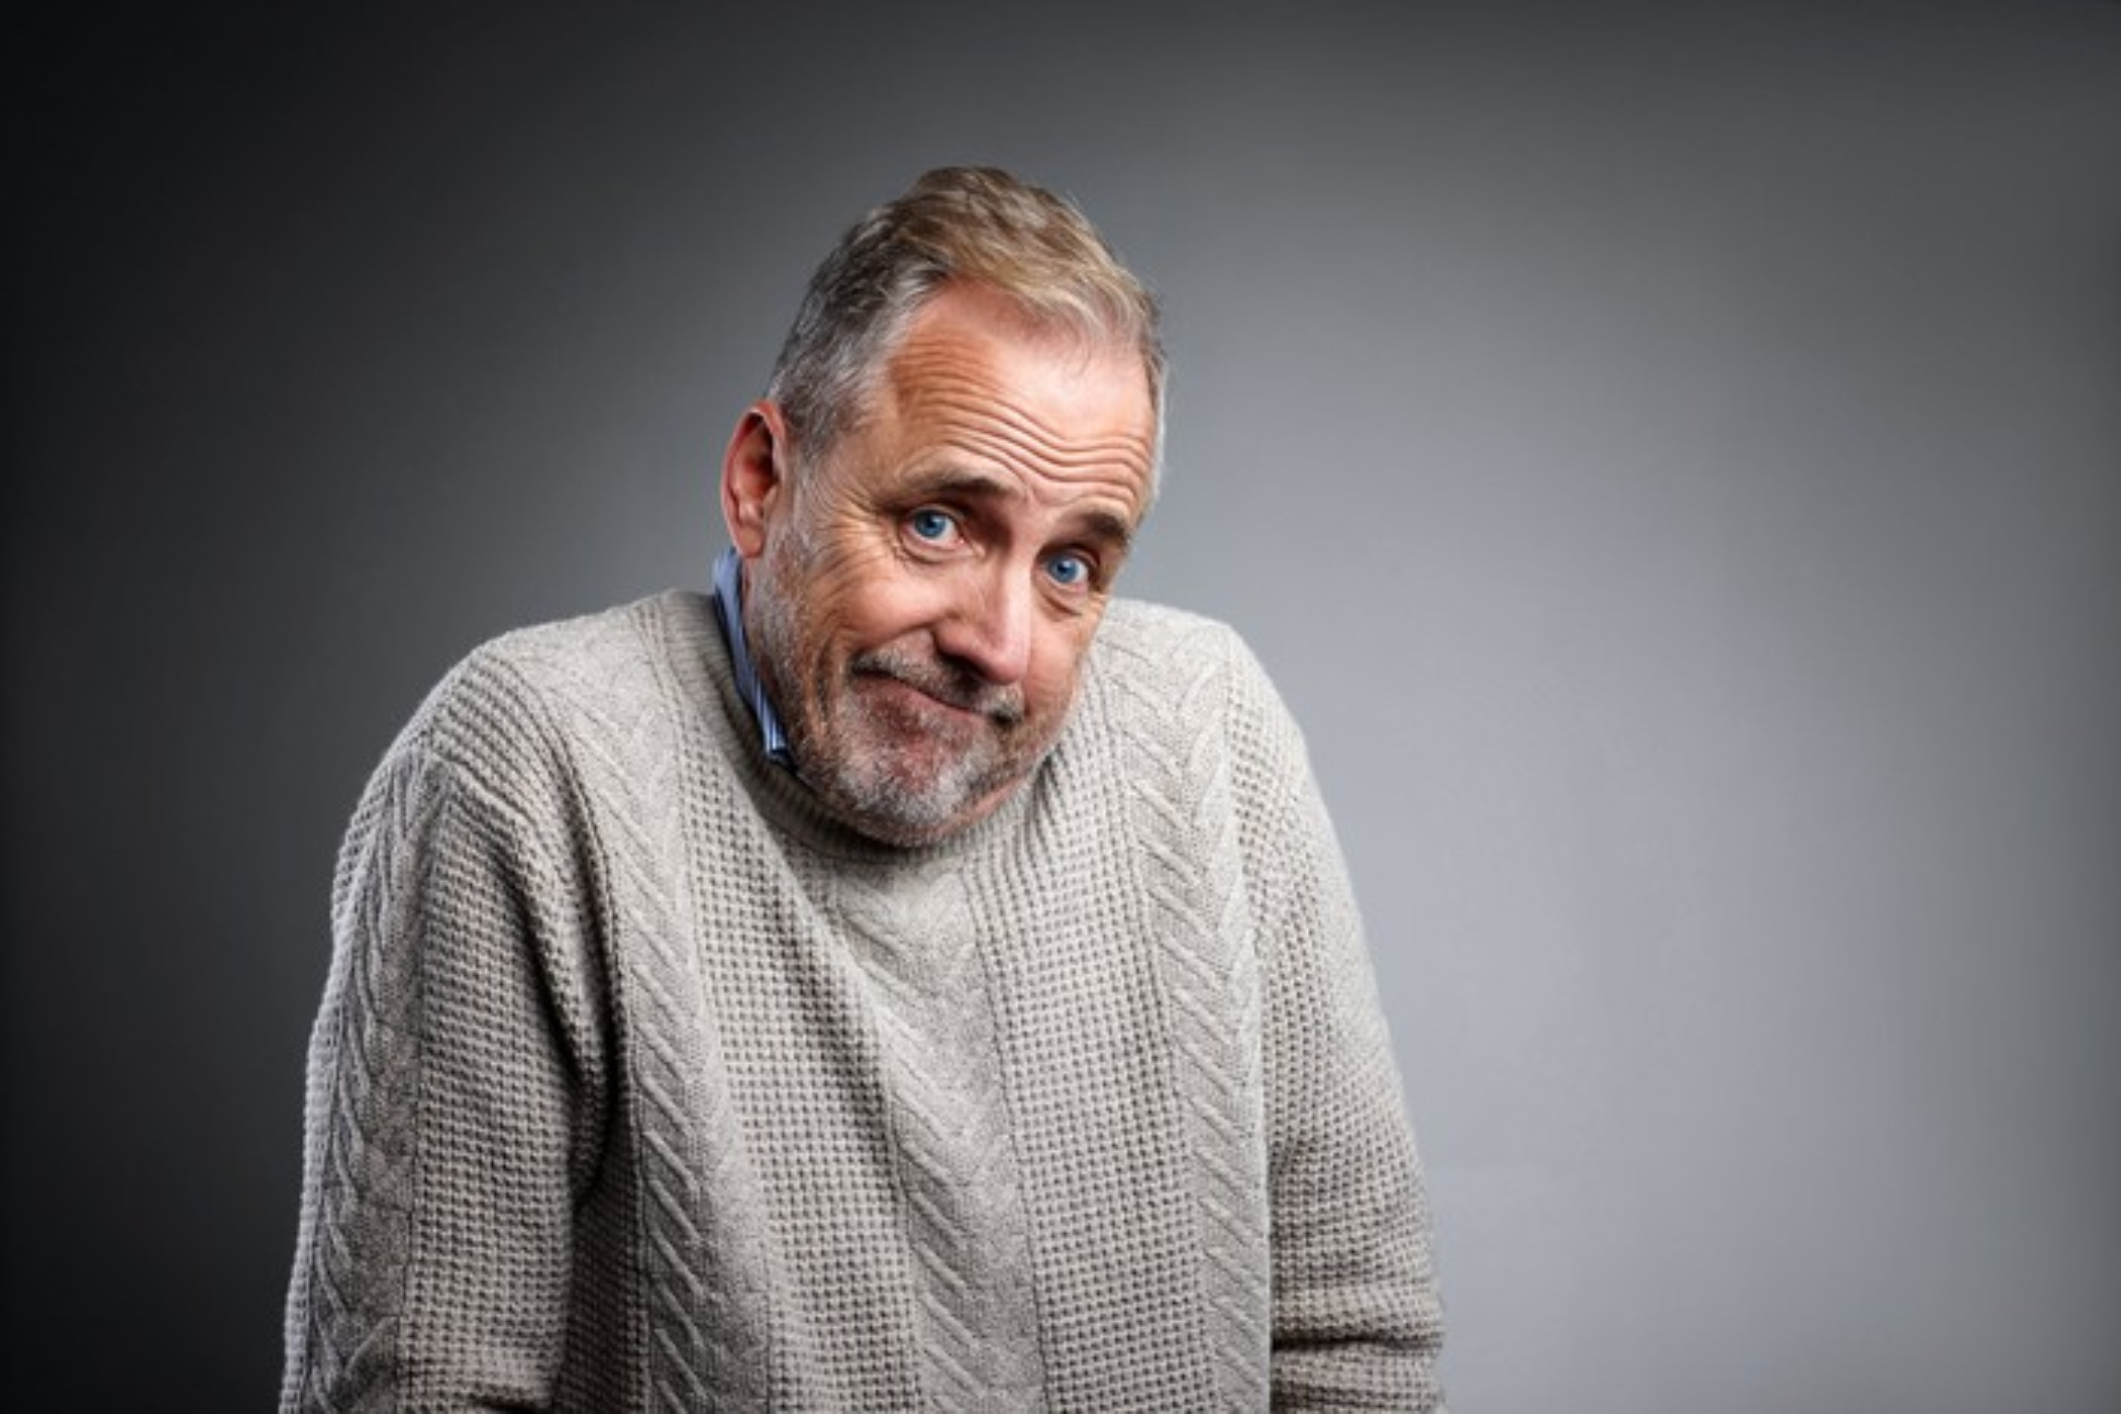 An elderly man shrugging his shoulders while smirking.